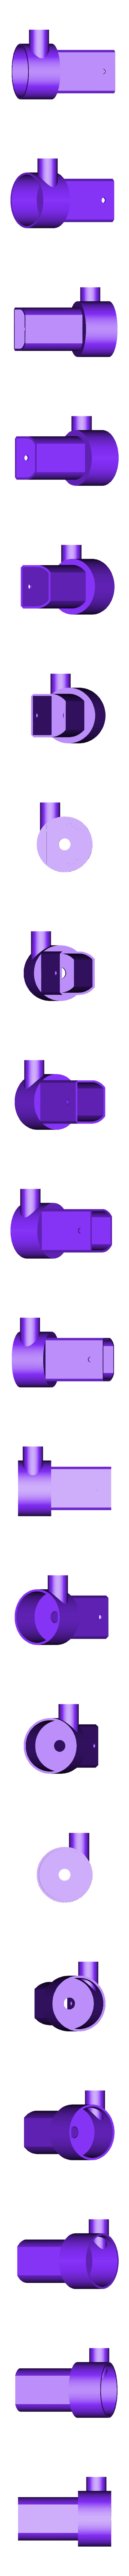 keha.stl Download free STL file Submersible water pump • 3D print template, LetsPrintYT